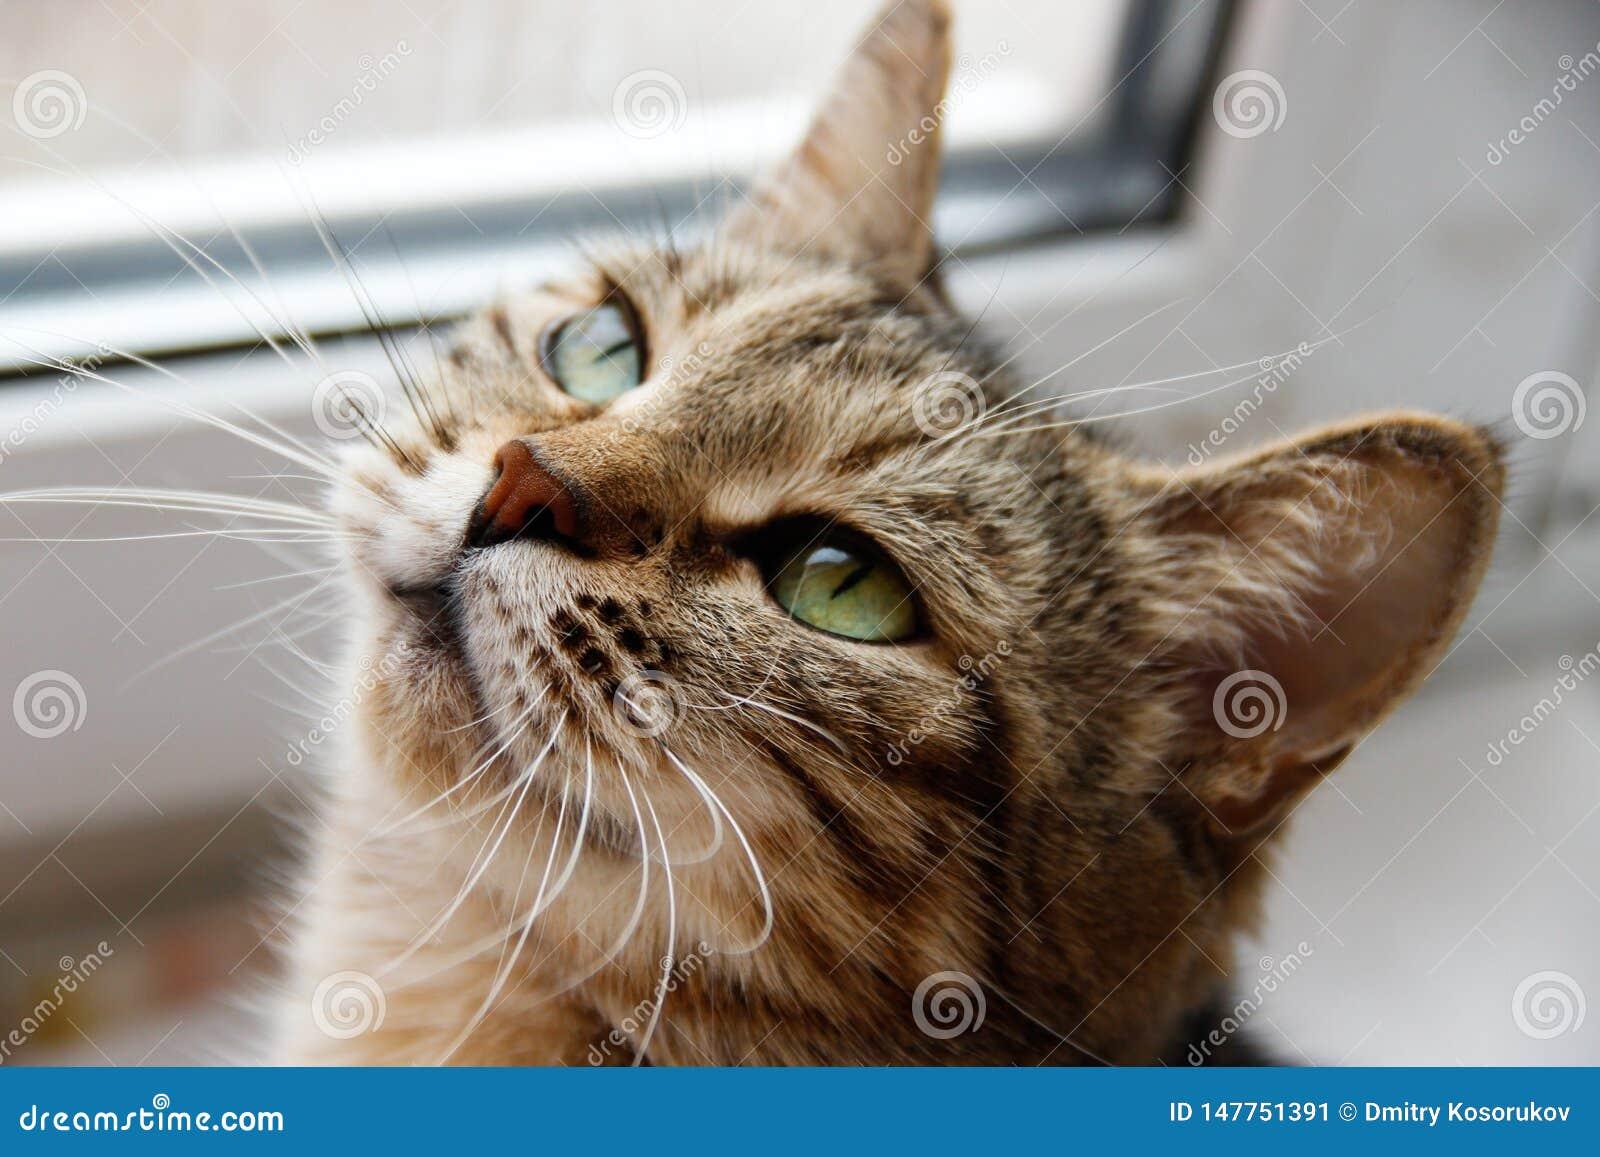 Graue Katze auf dem Fensterbrett